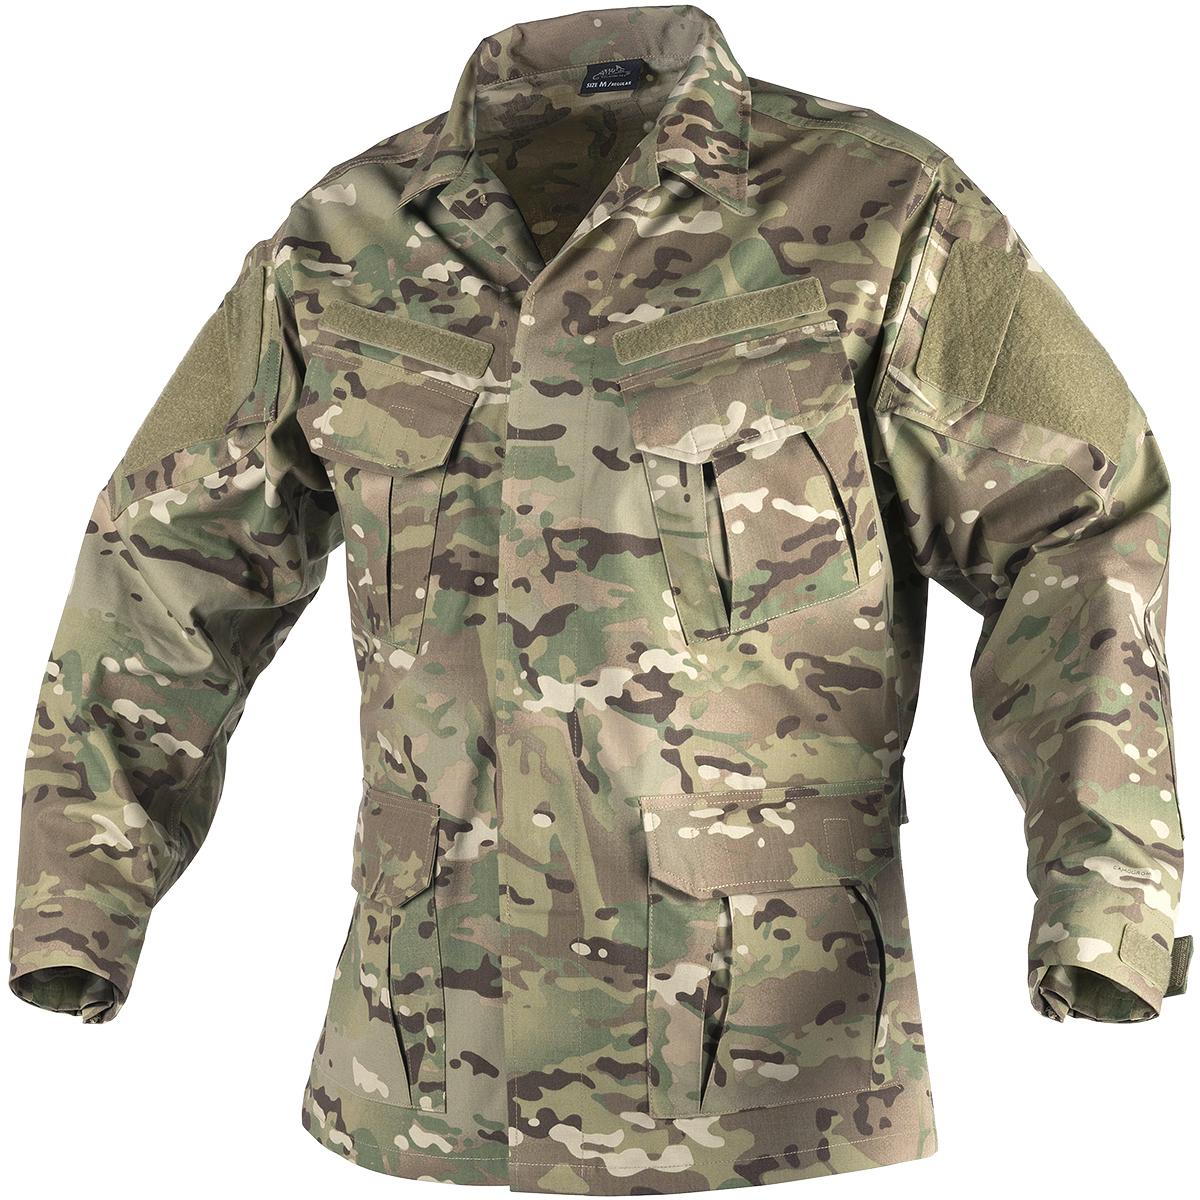 Military Uniform Jacket 28